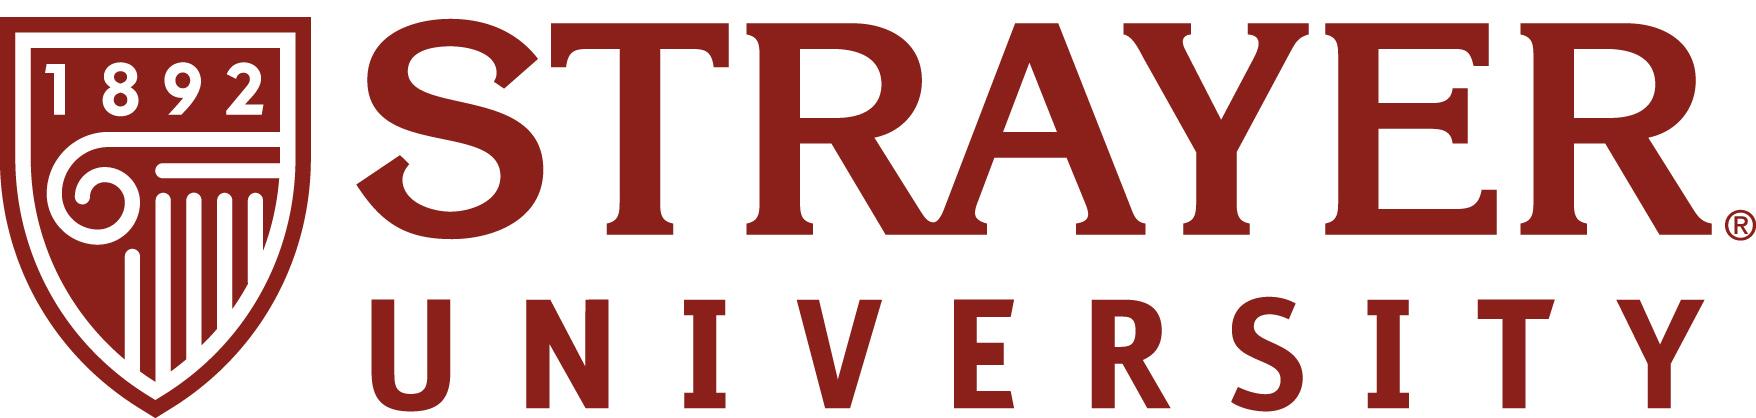 strayer - collegecliffs.com